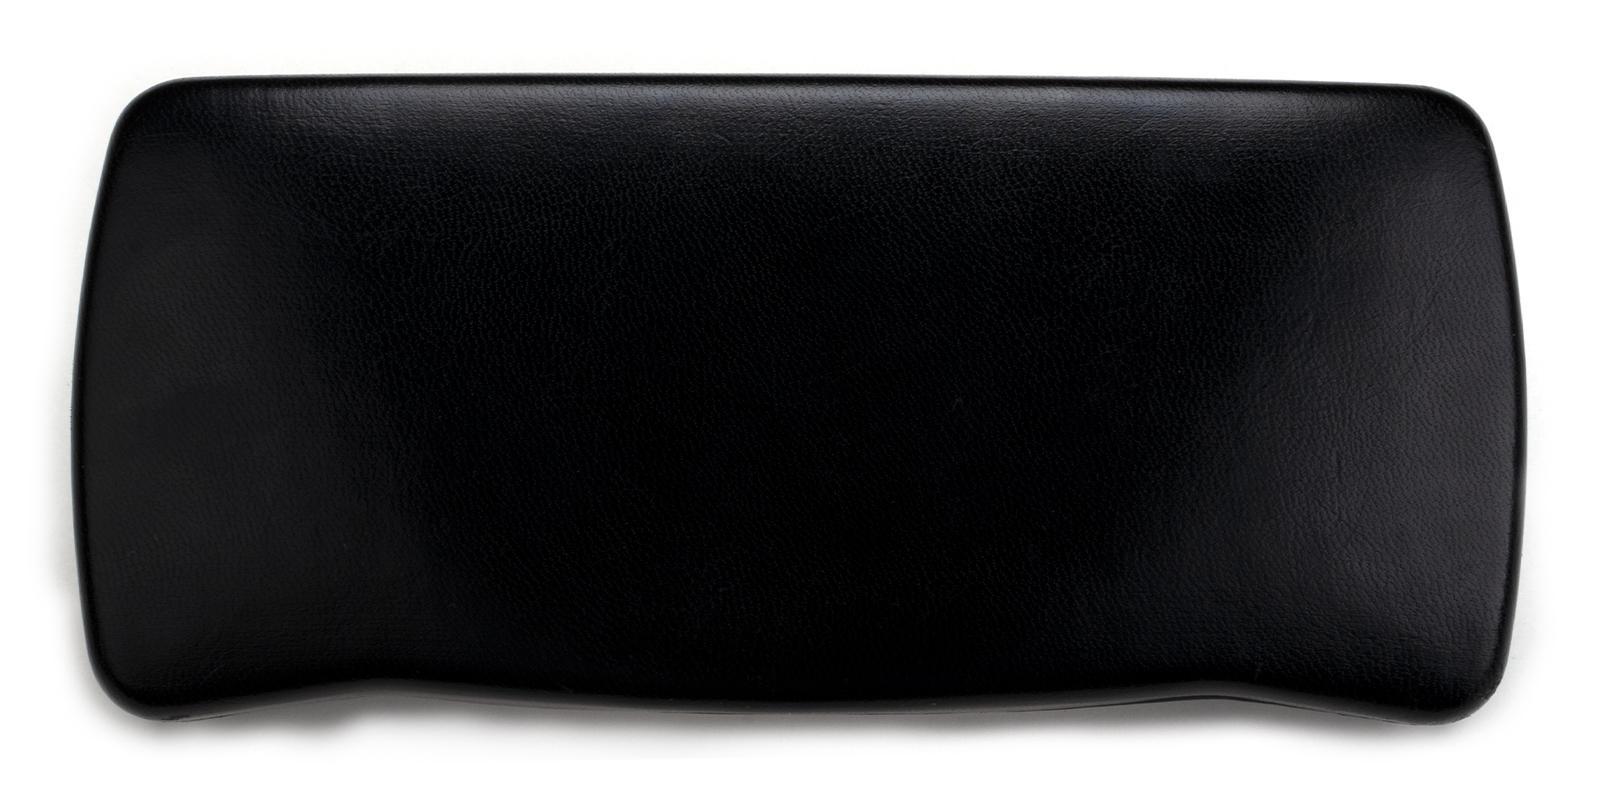 Sturdy Sunglasses Case Black   Frames from ABBE Glasses